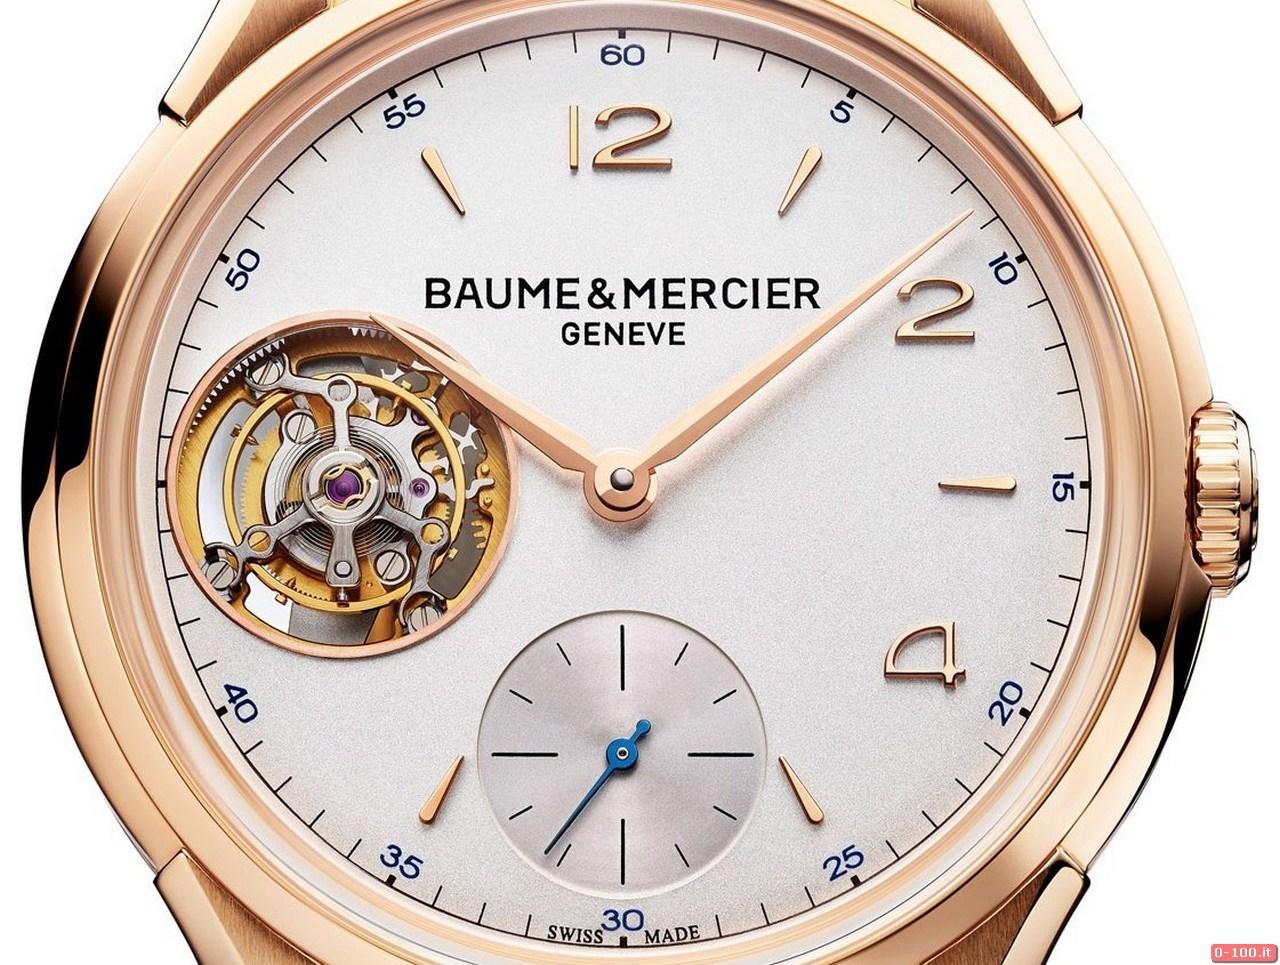 sihh-2014-baume-mercier-clifton-1892-flying-tourbillon-prezzo-price_0-1003